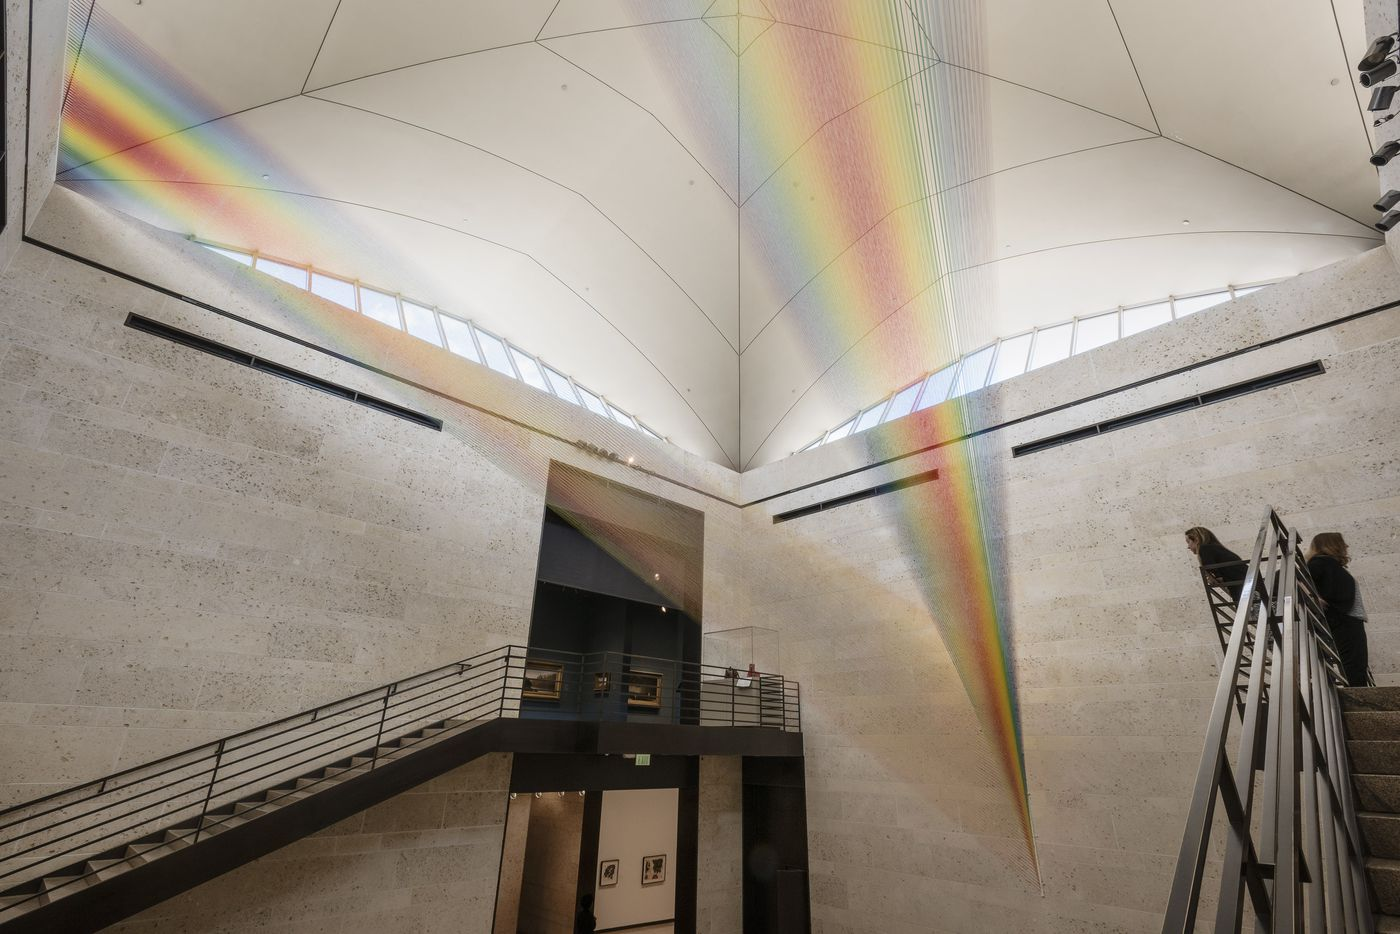 Plexus 34 by Gabriel Dawe, installed at the Amon Carter Museum of American Art, August 2016.